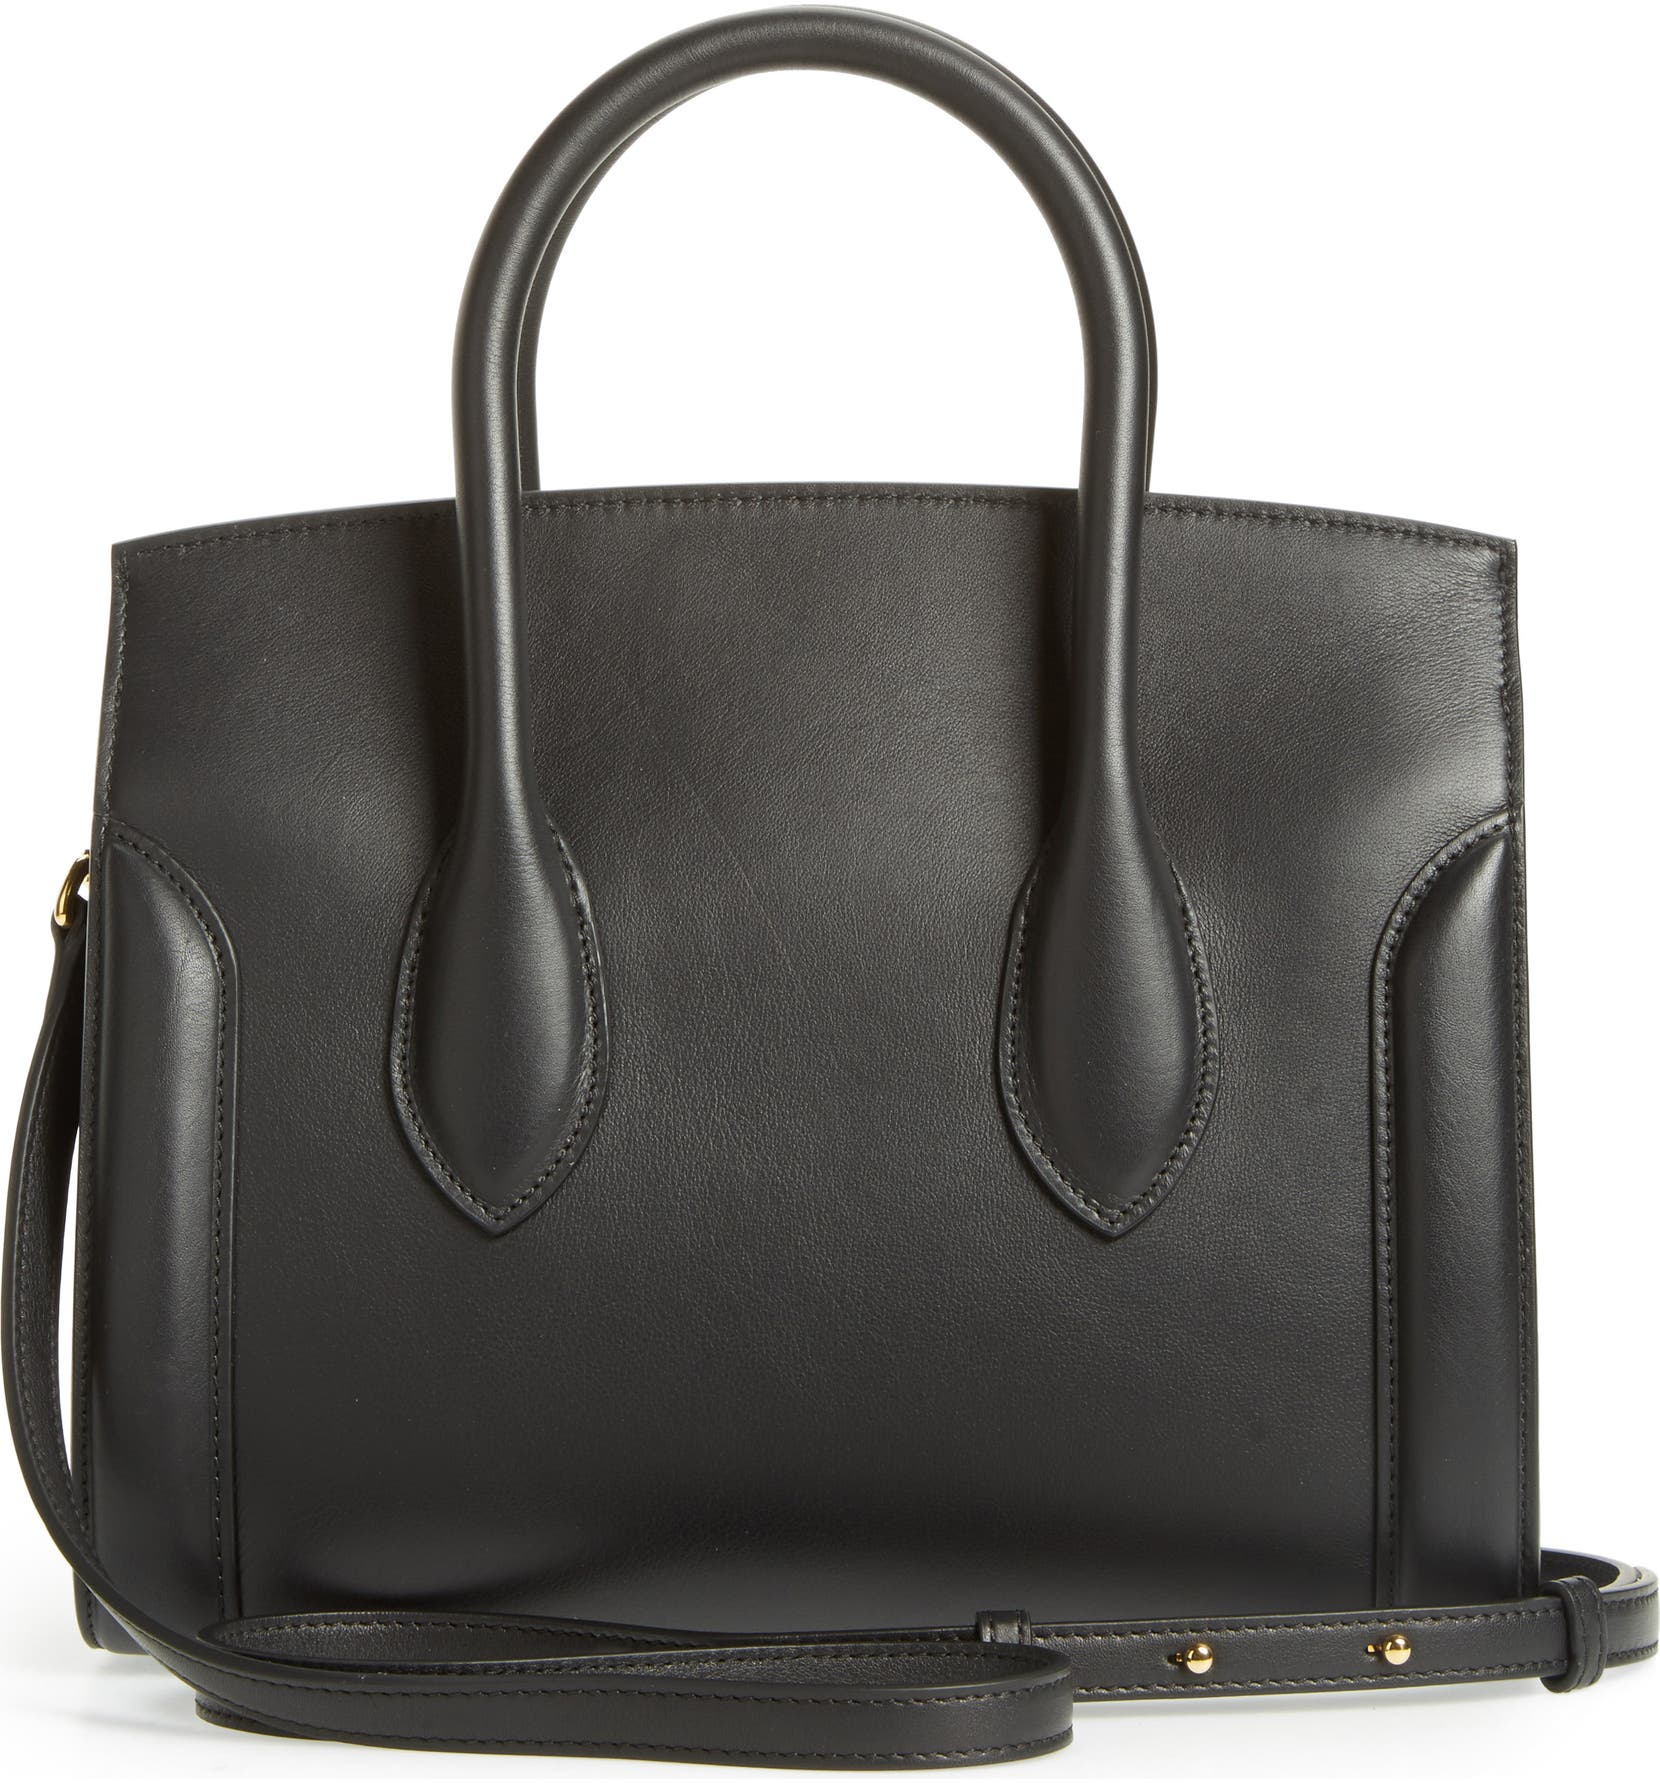 975fa9f357614 Alexander McQueen Heroine 30 Sweet Calfskin Leather Shopper | Nordstrom